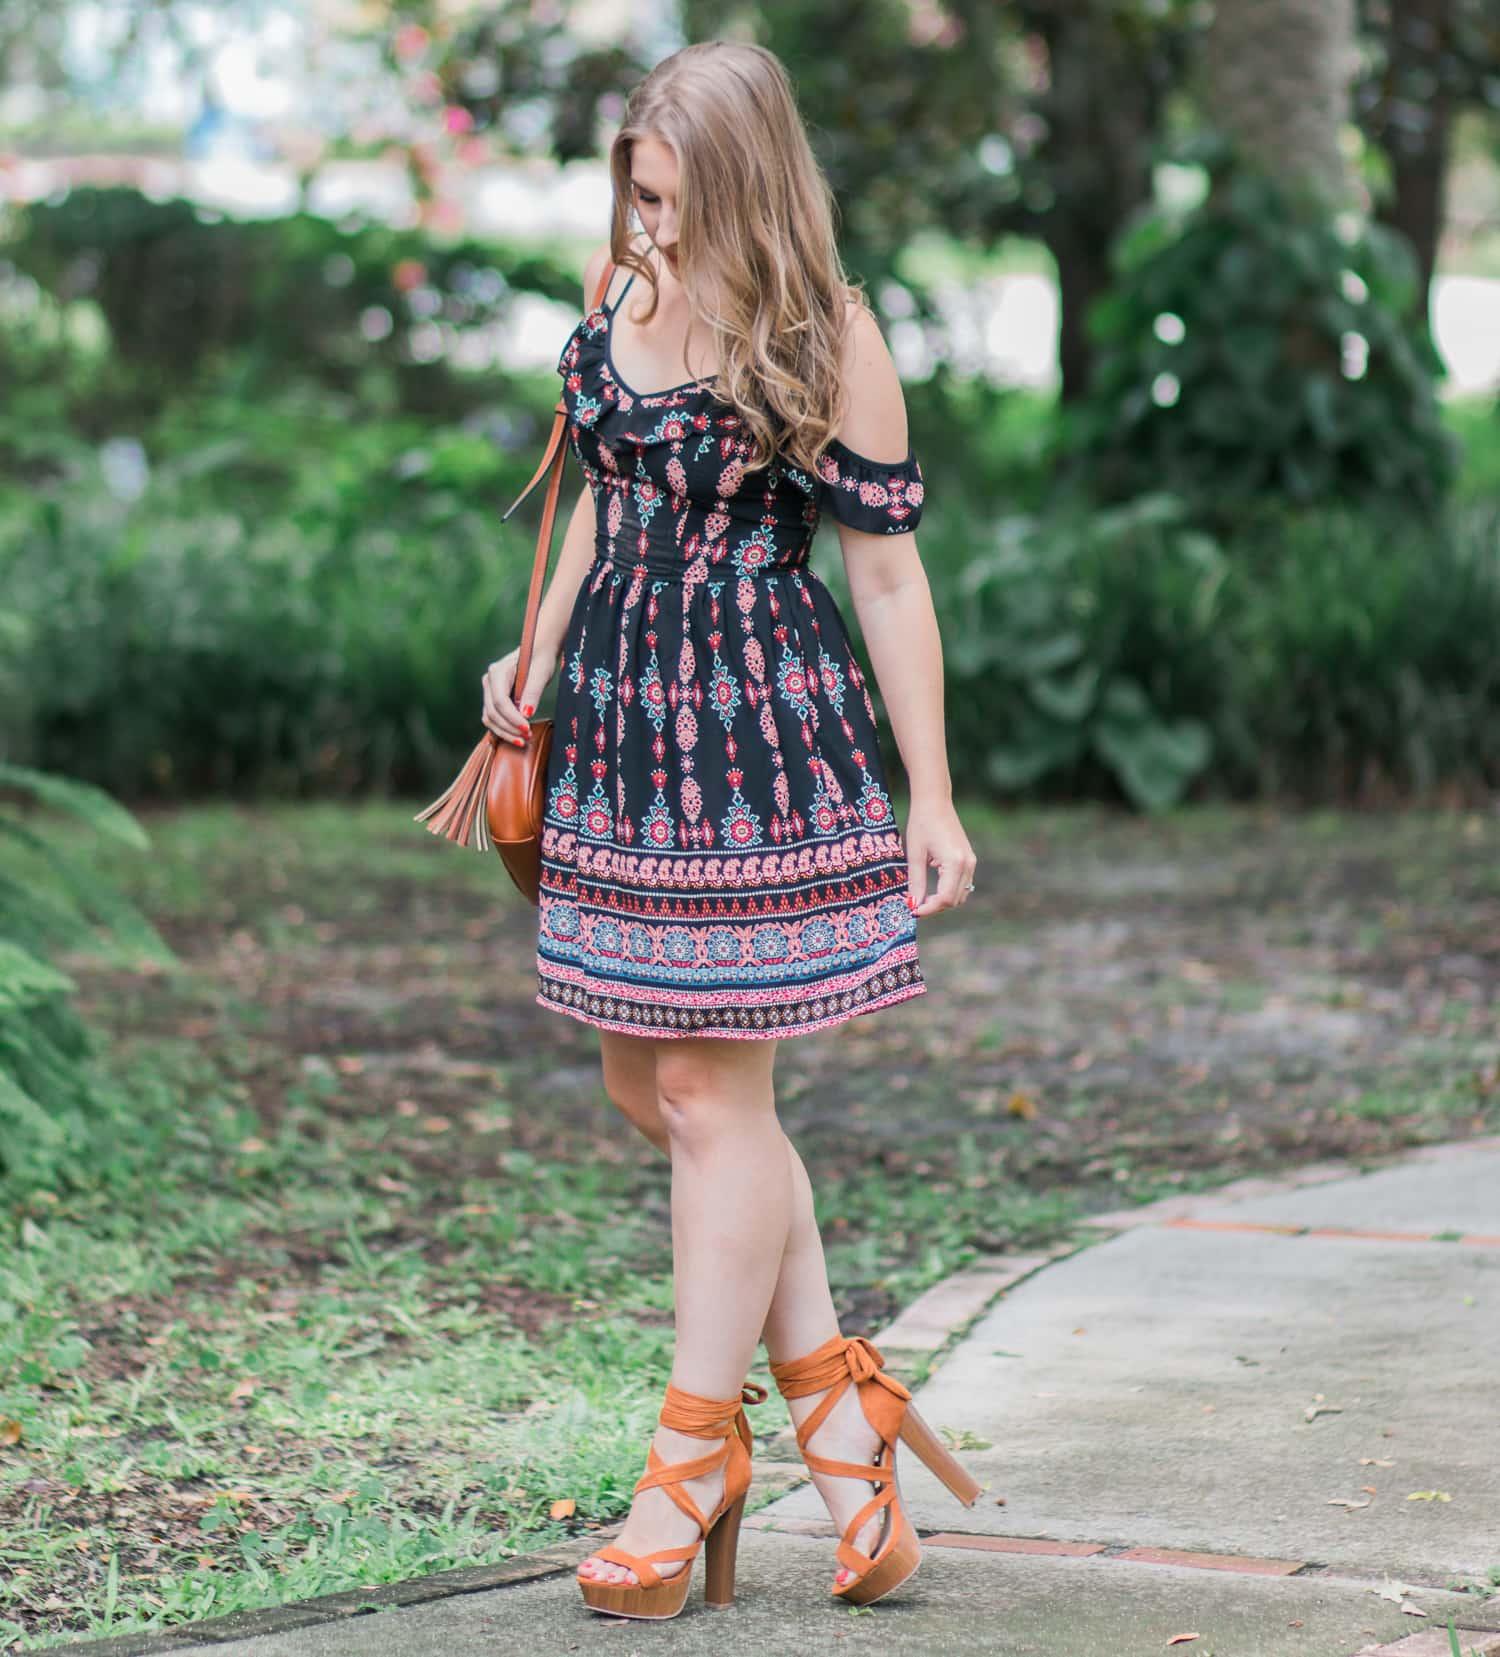 off-the-shoulder-summer-dress-ashley-brooke-nicholas-4012